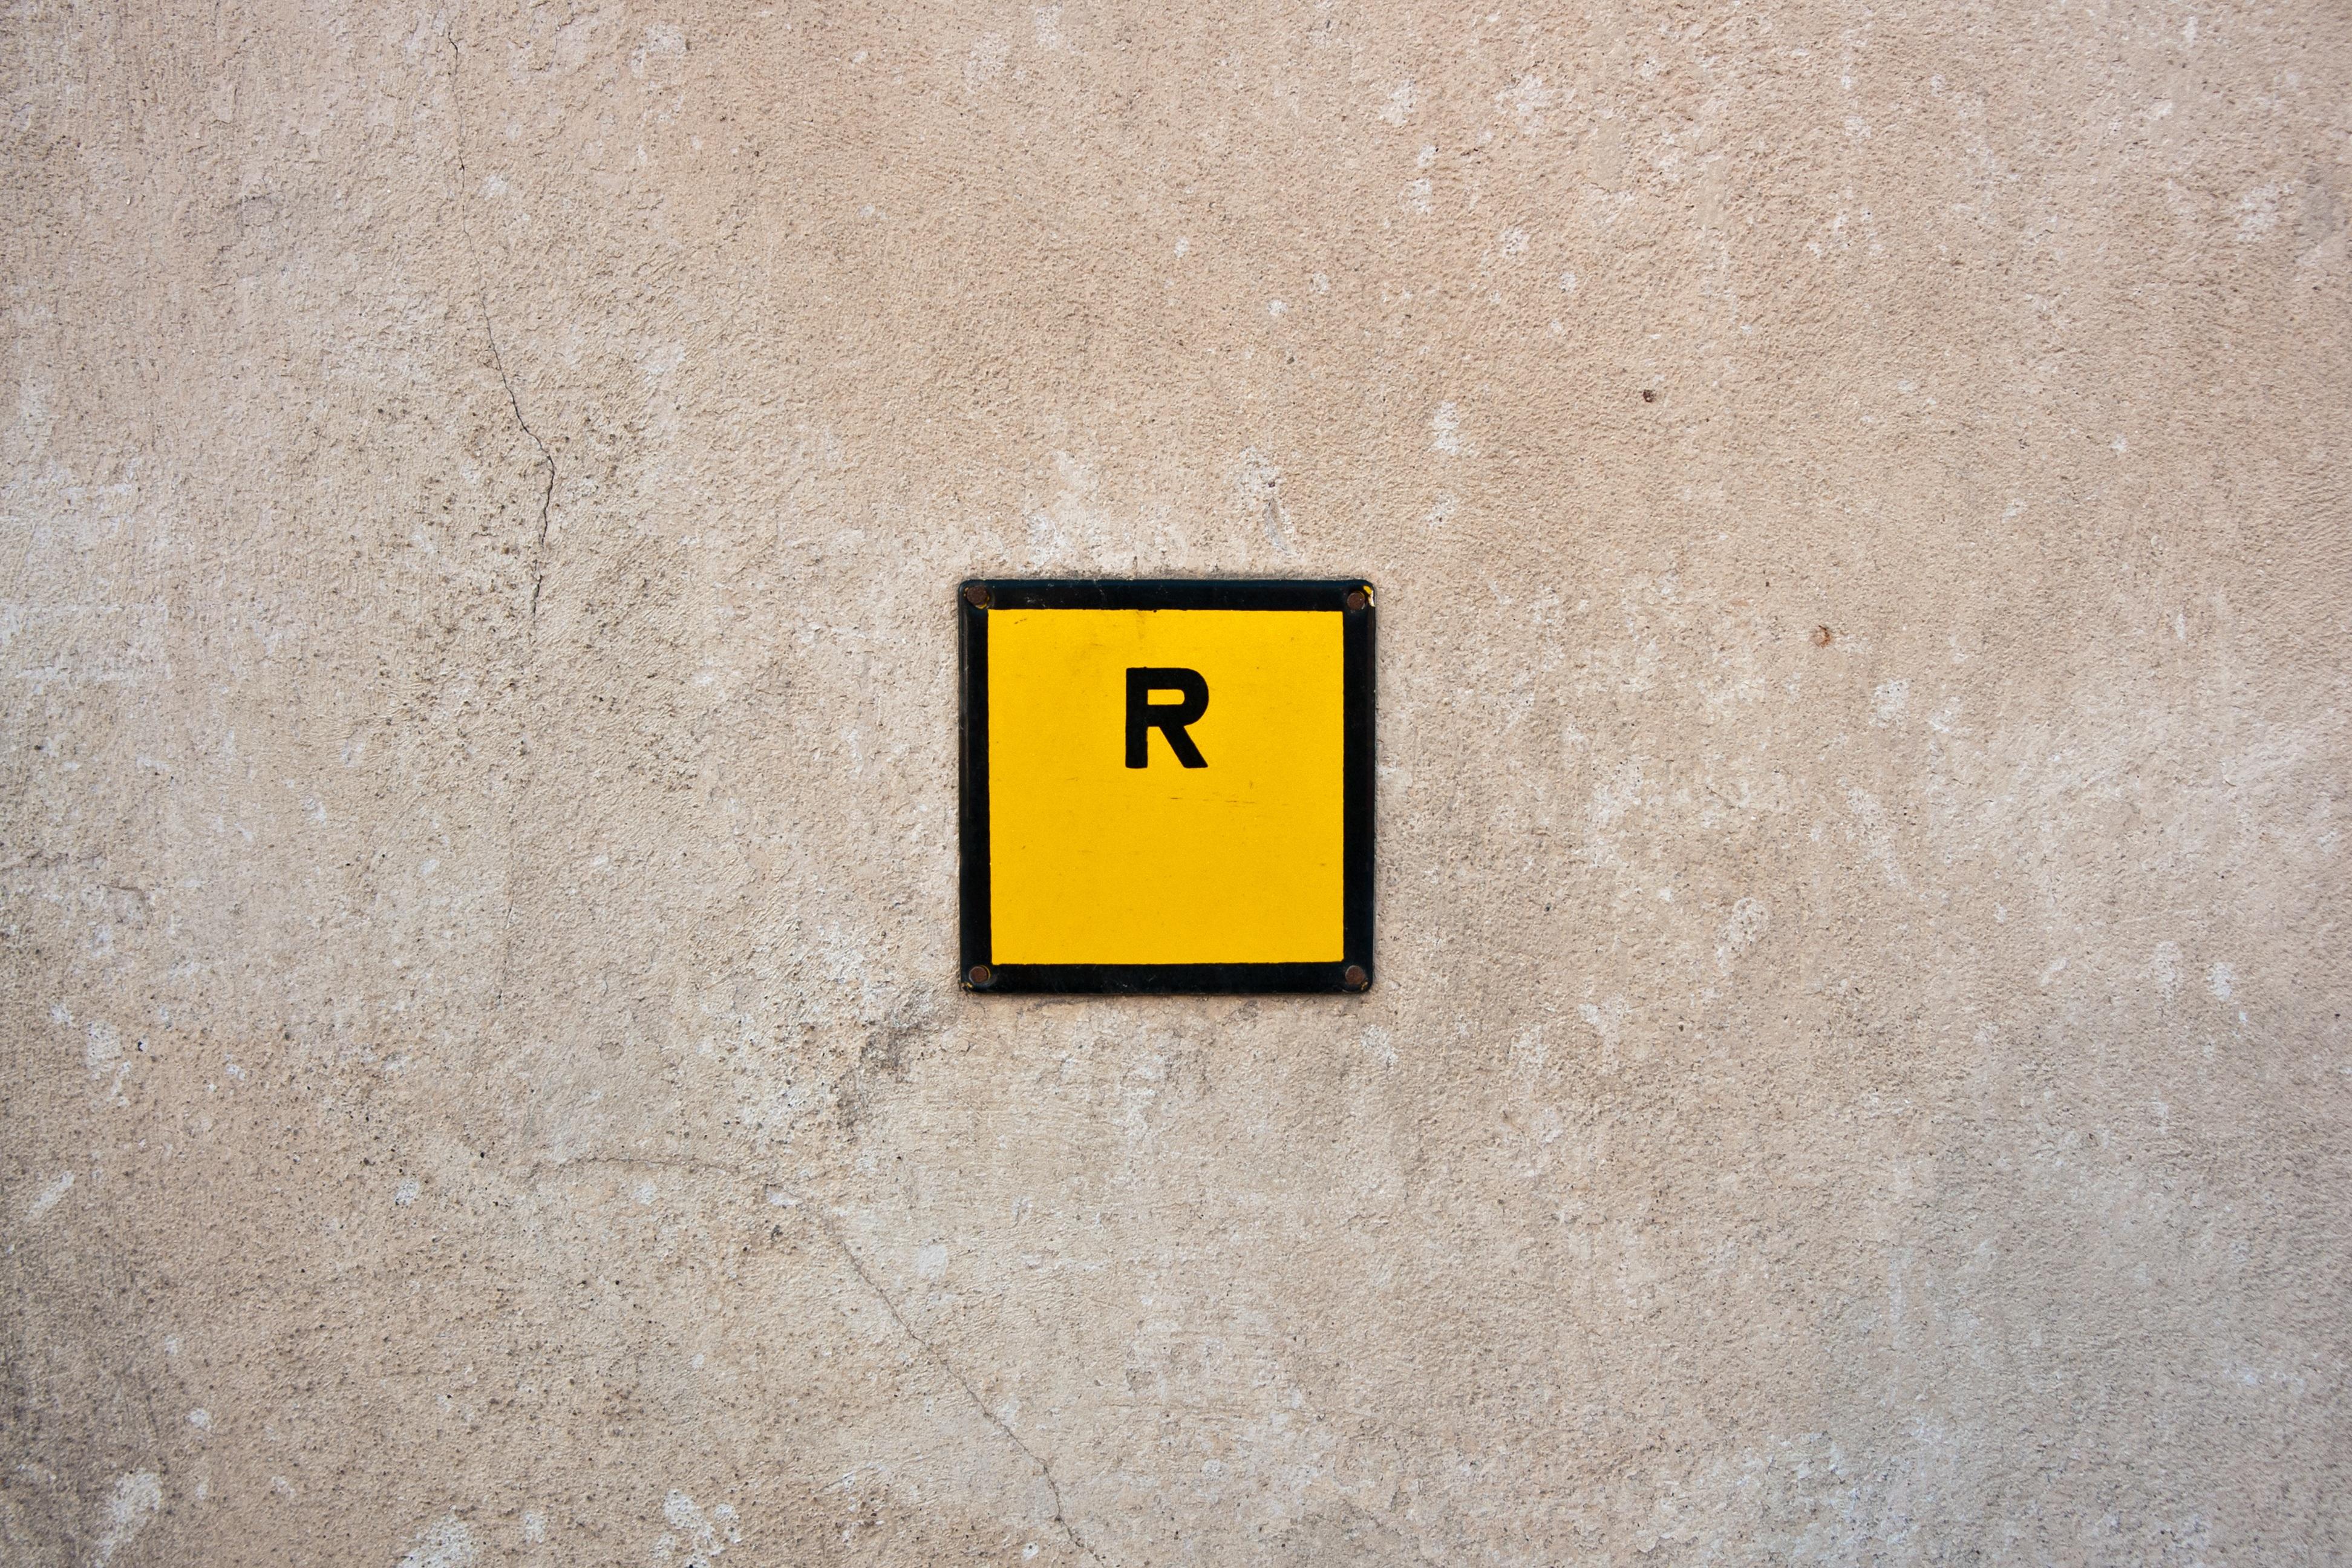 Fotos gratis : blanco, textura, piso, número, pared, firmar, símbolo ...